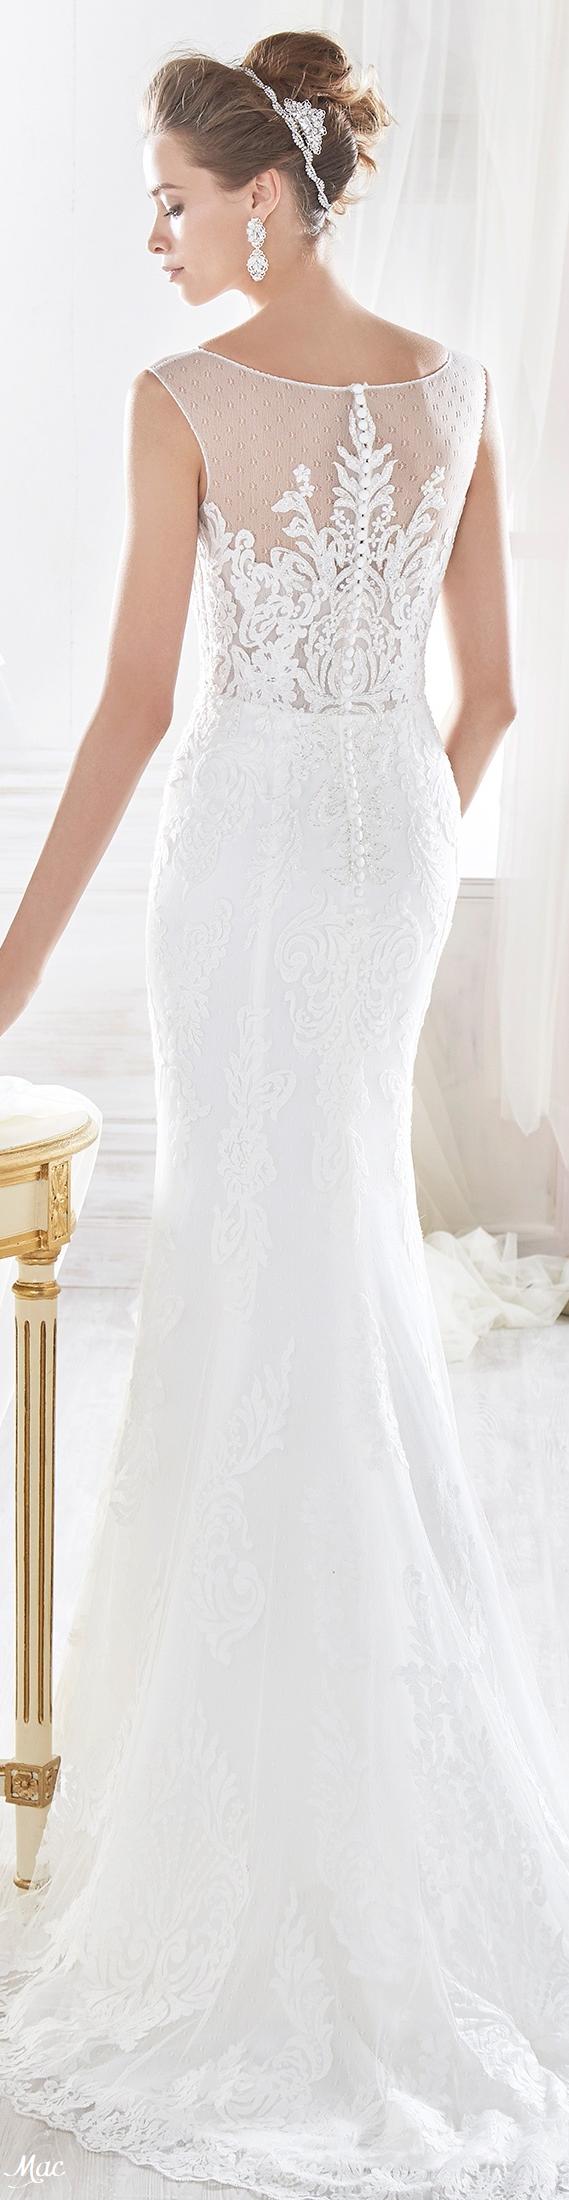 Spring bridal nicole collection nicole bridal couture